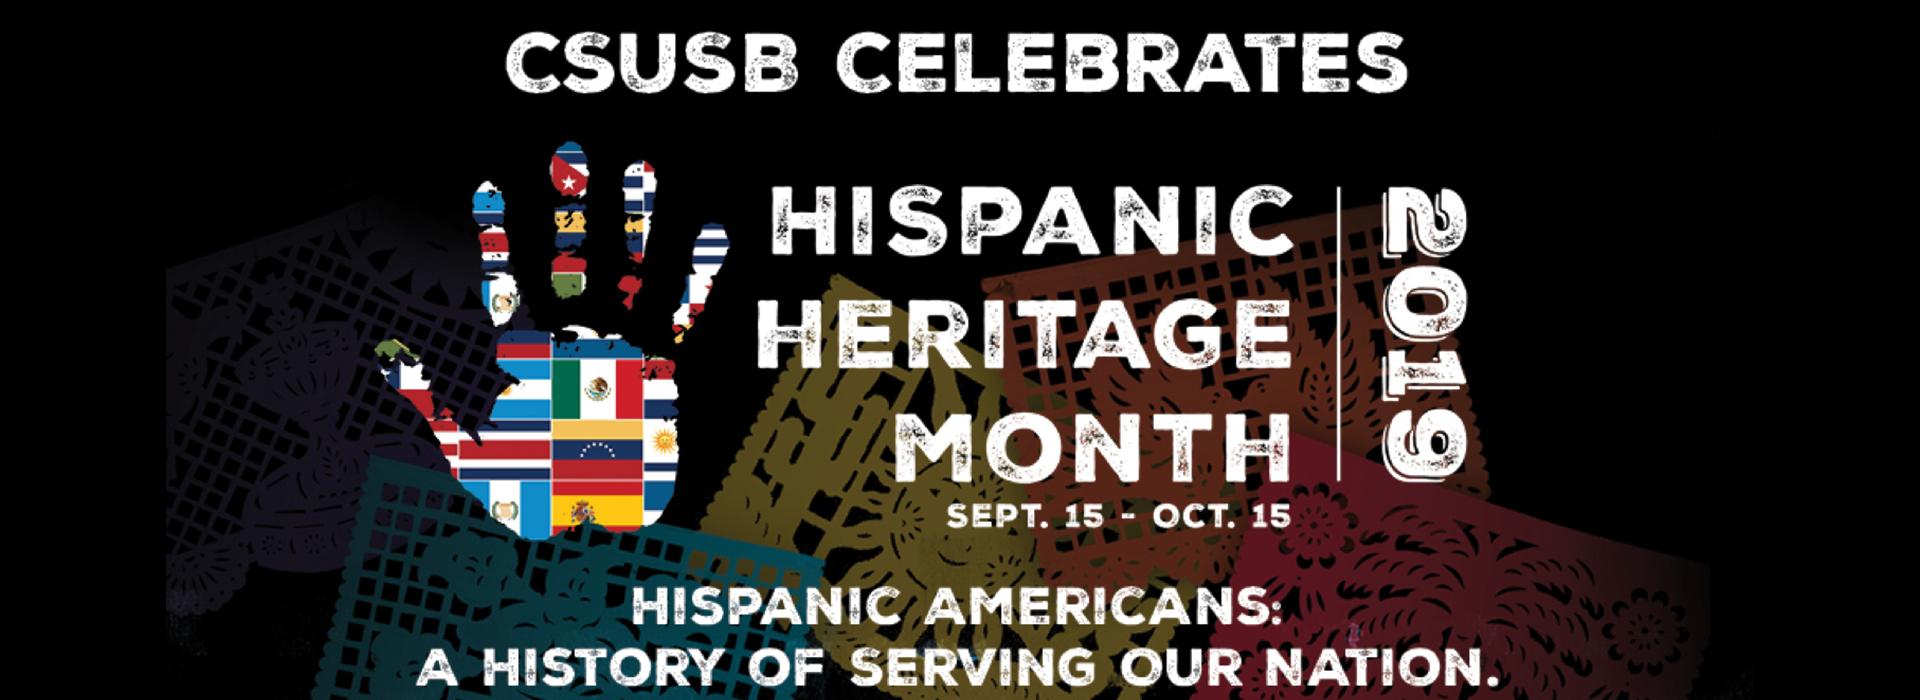 CSUSB's National Hispanic Heritage Month celebration continues through Oct. 15